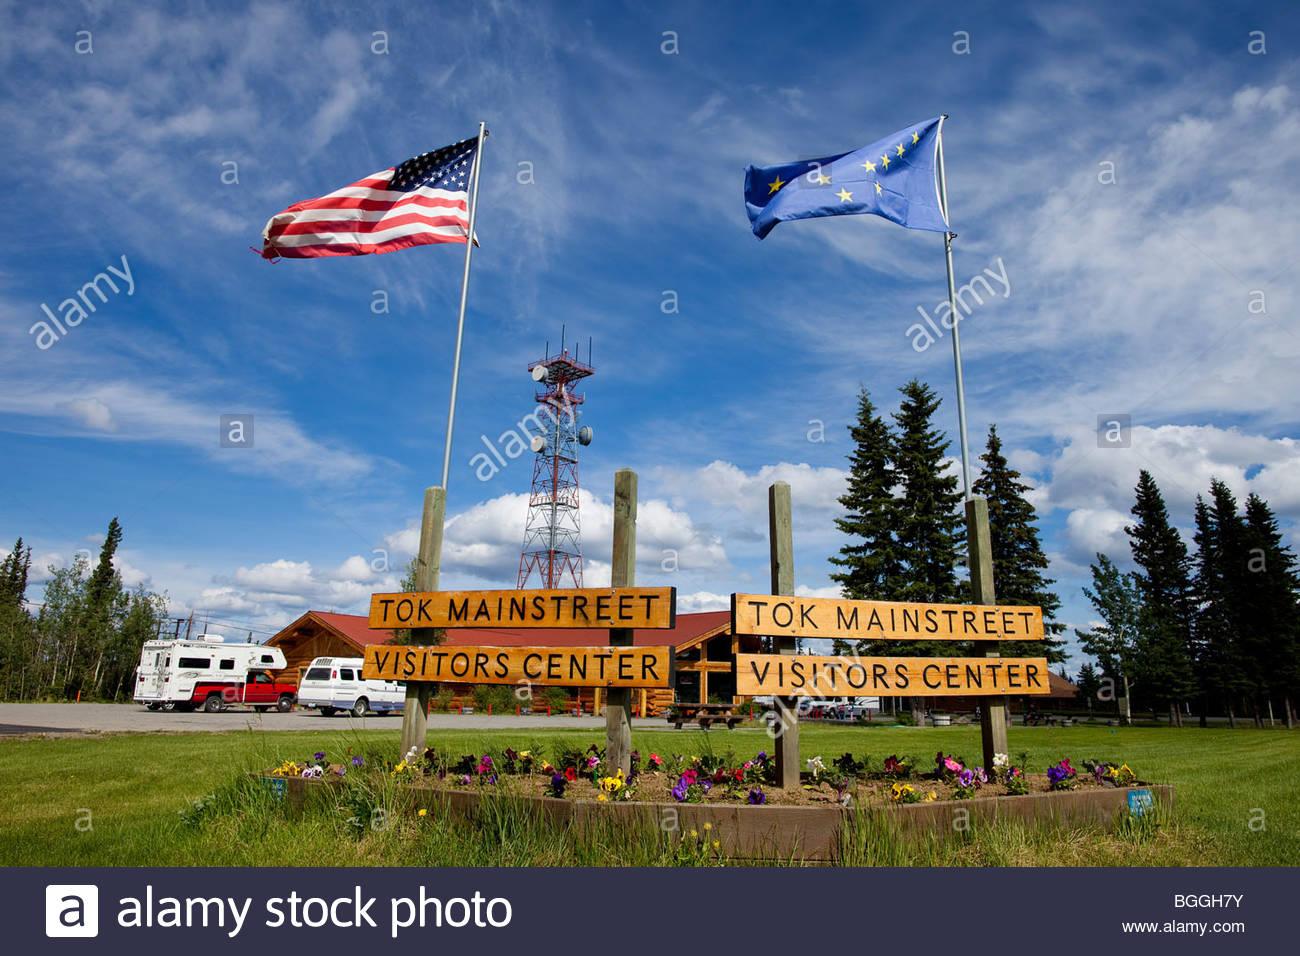 Alaska, Tok. Visitor's Center. Stock Photo